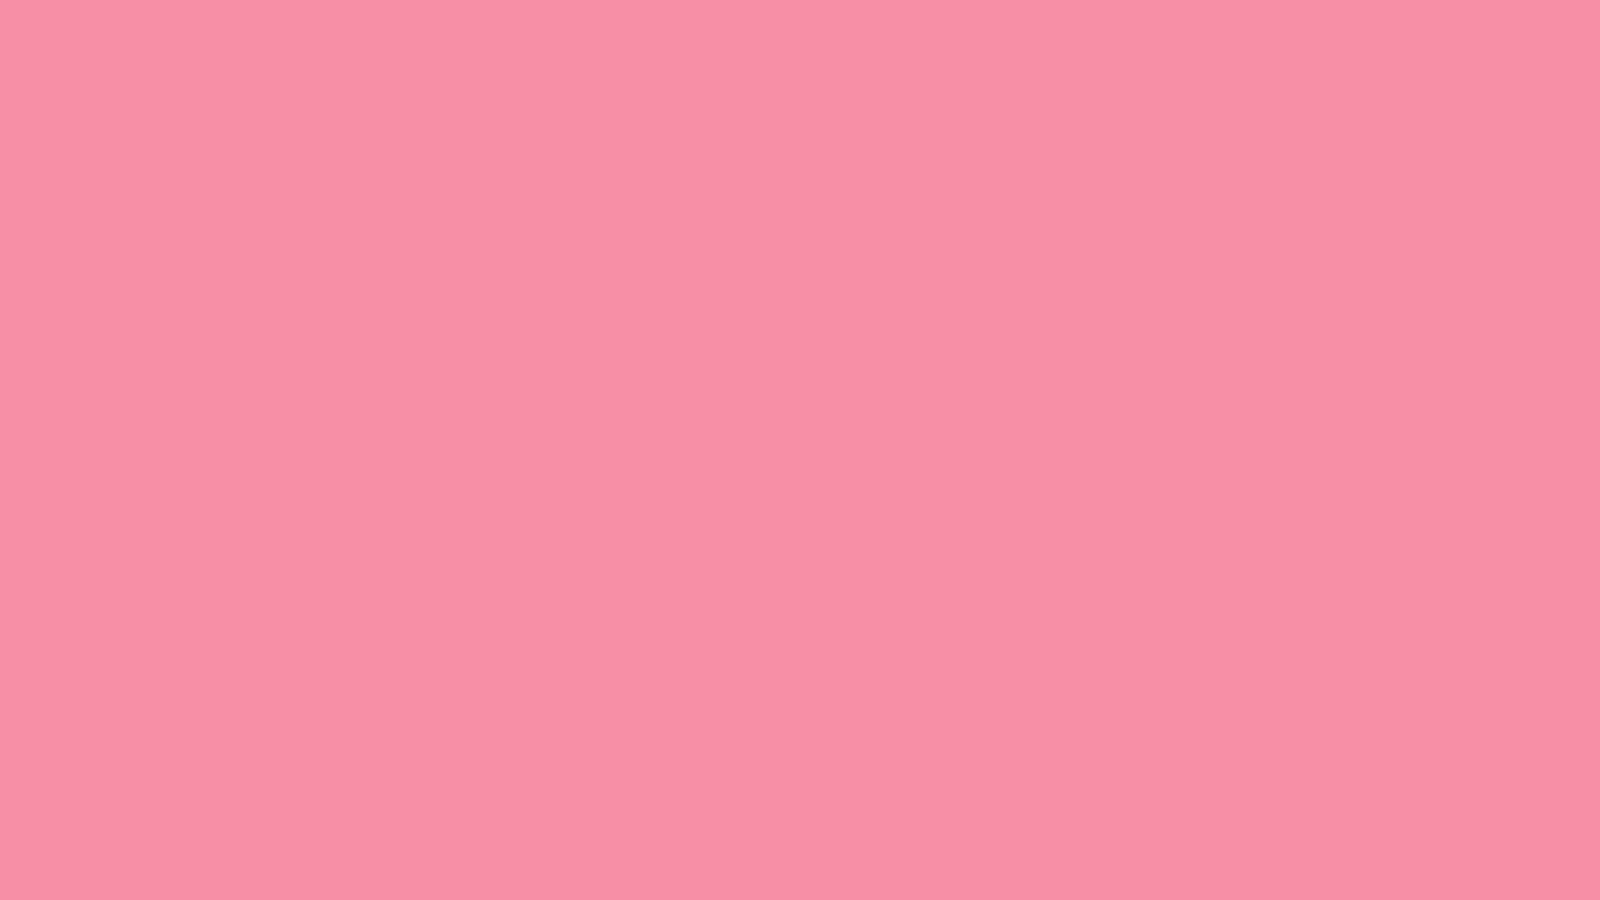 1600x900 Pink Sherbet Solid Color Background